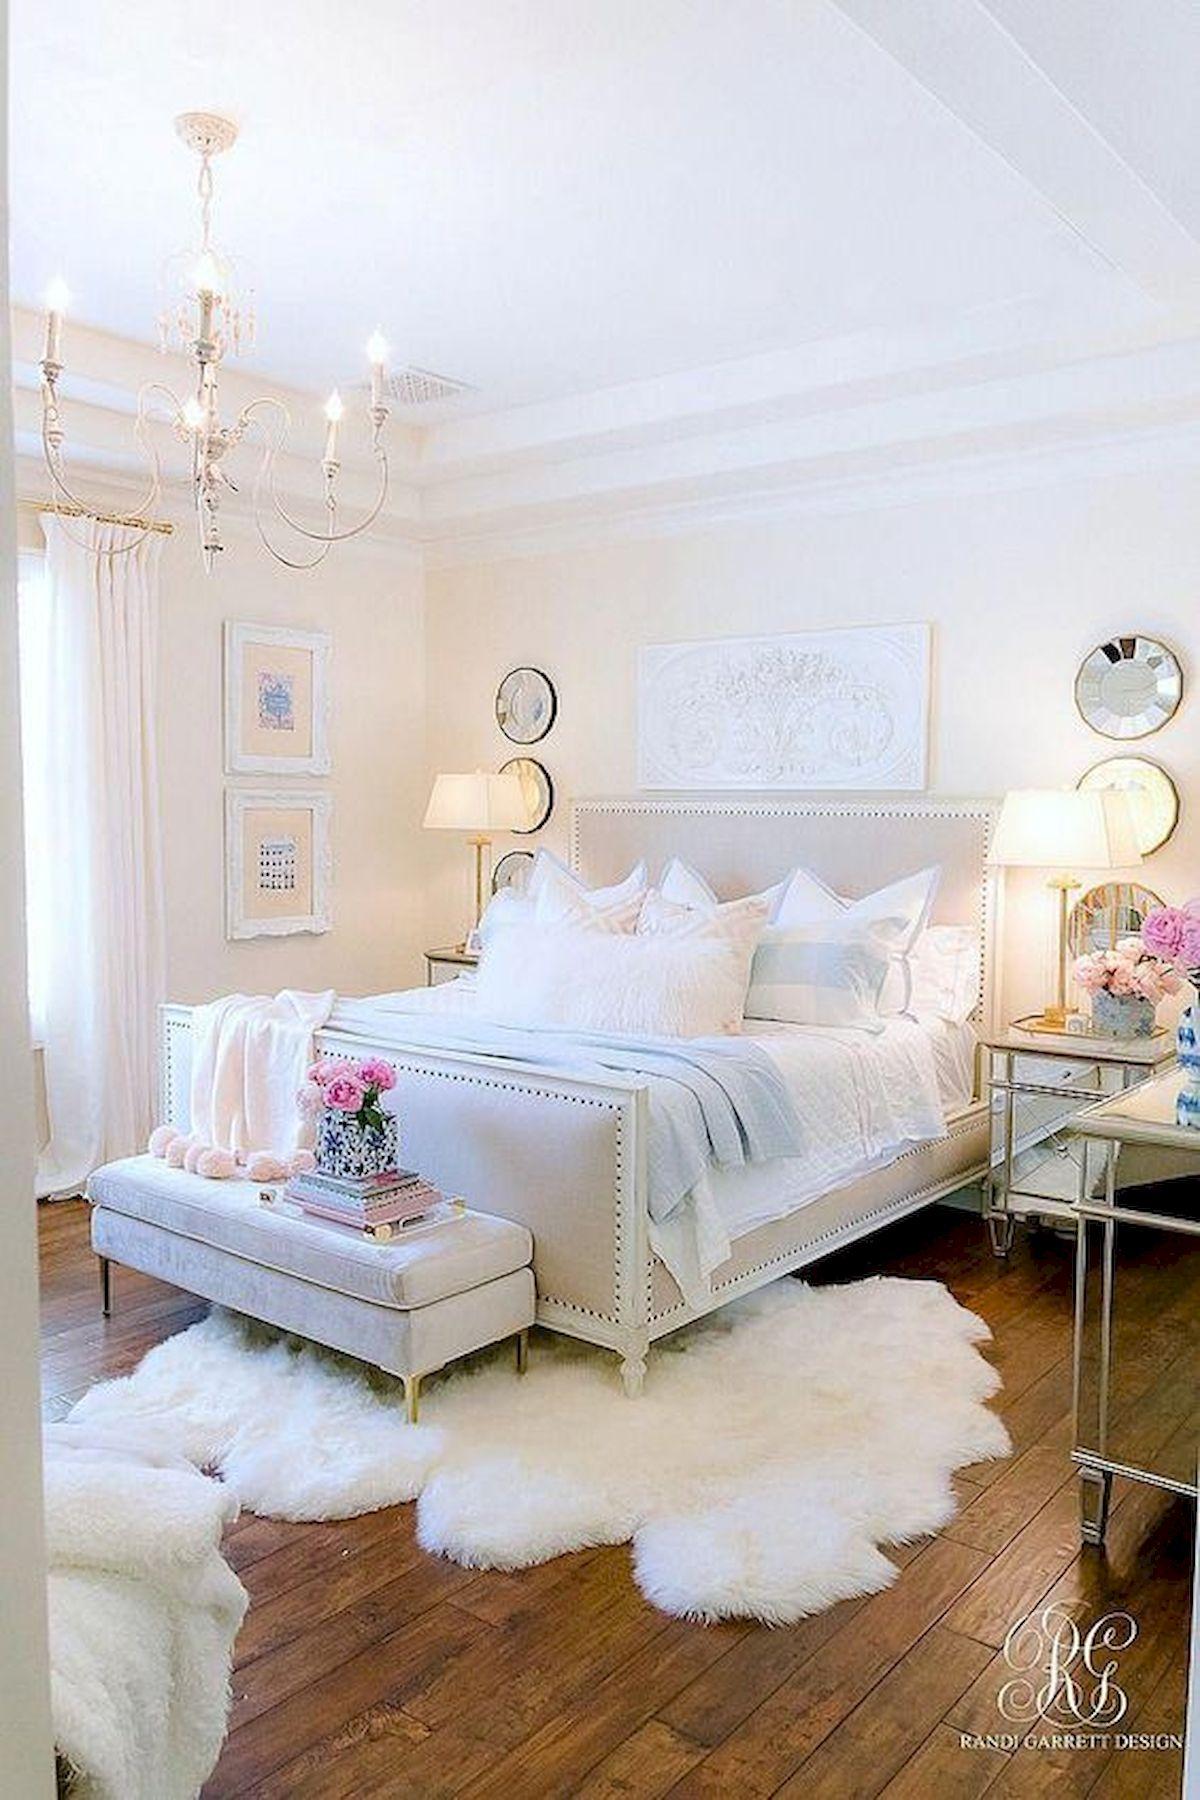 37 Simple Summer Bedroom Decor Ideas (34)